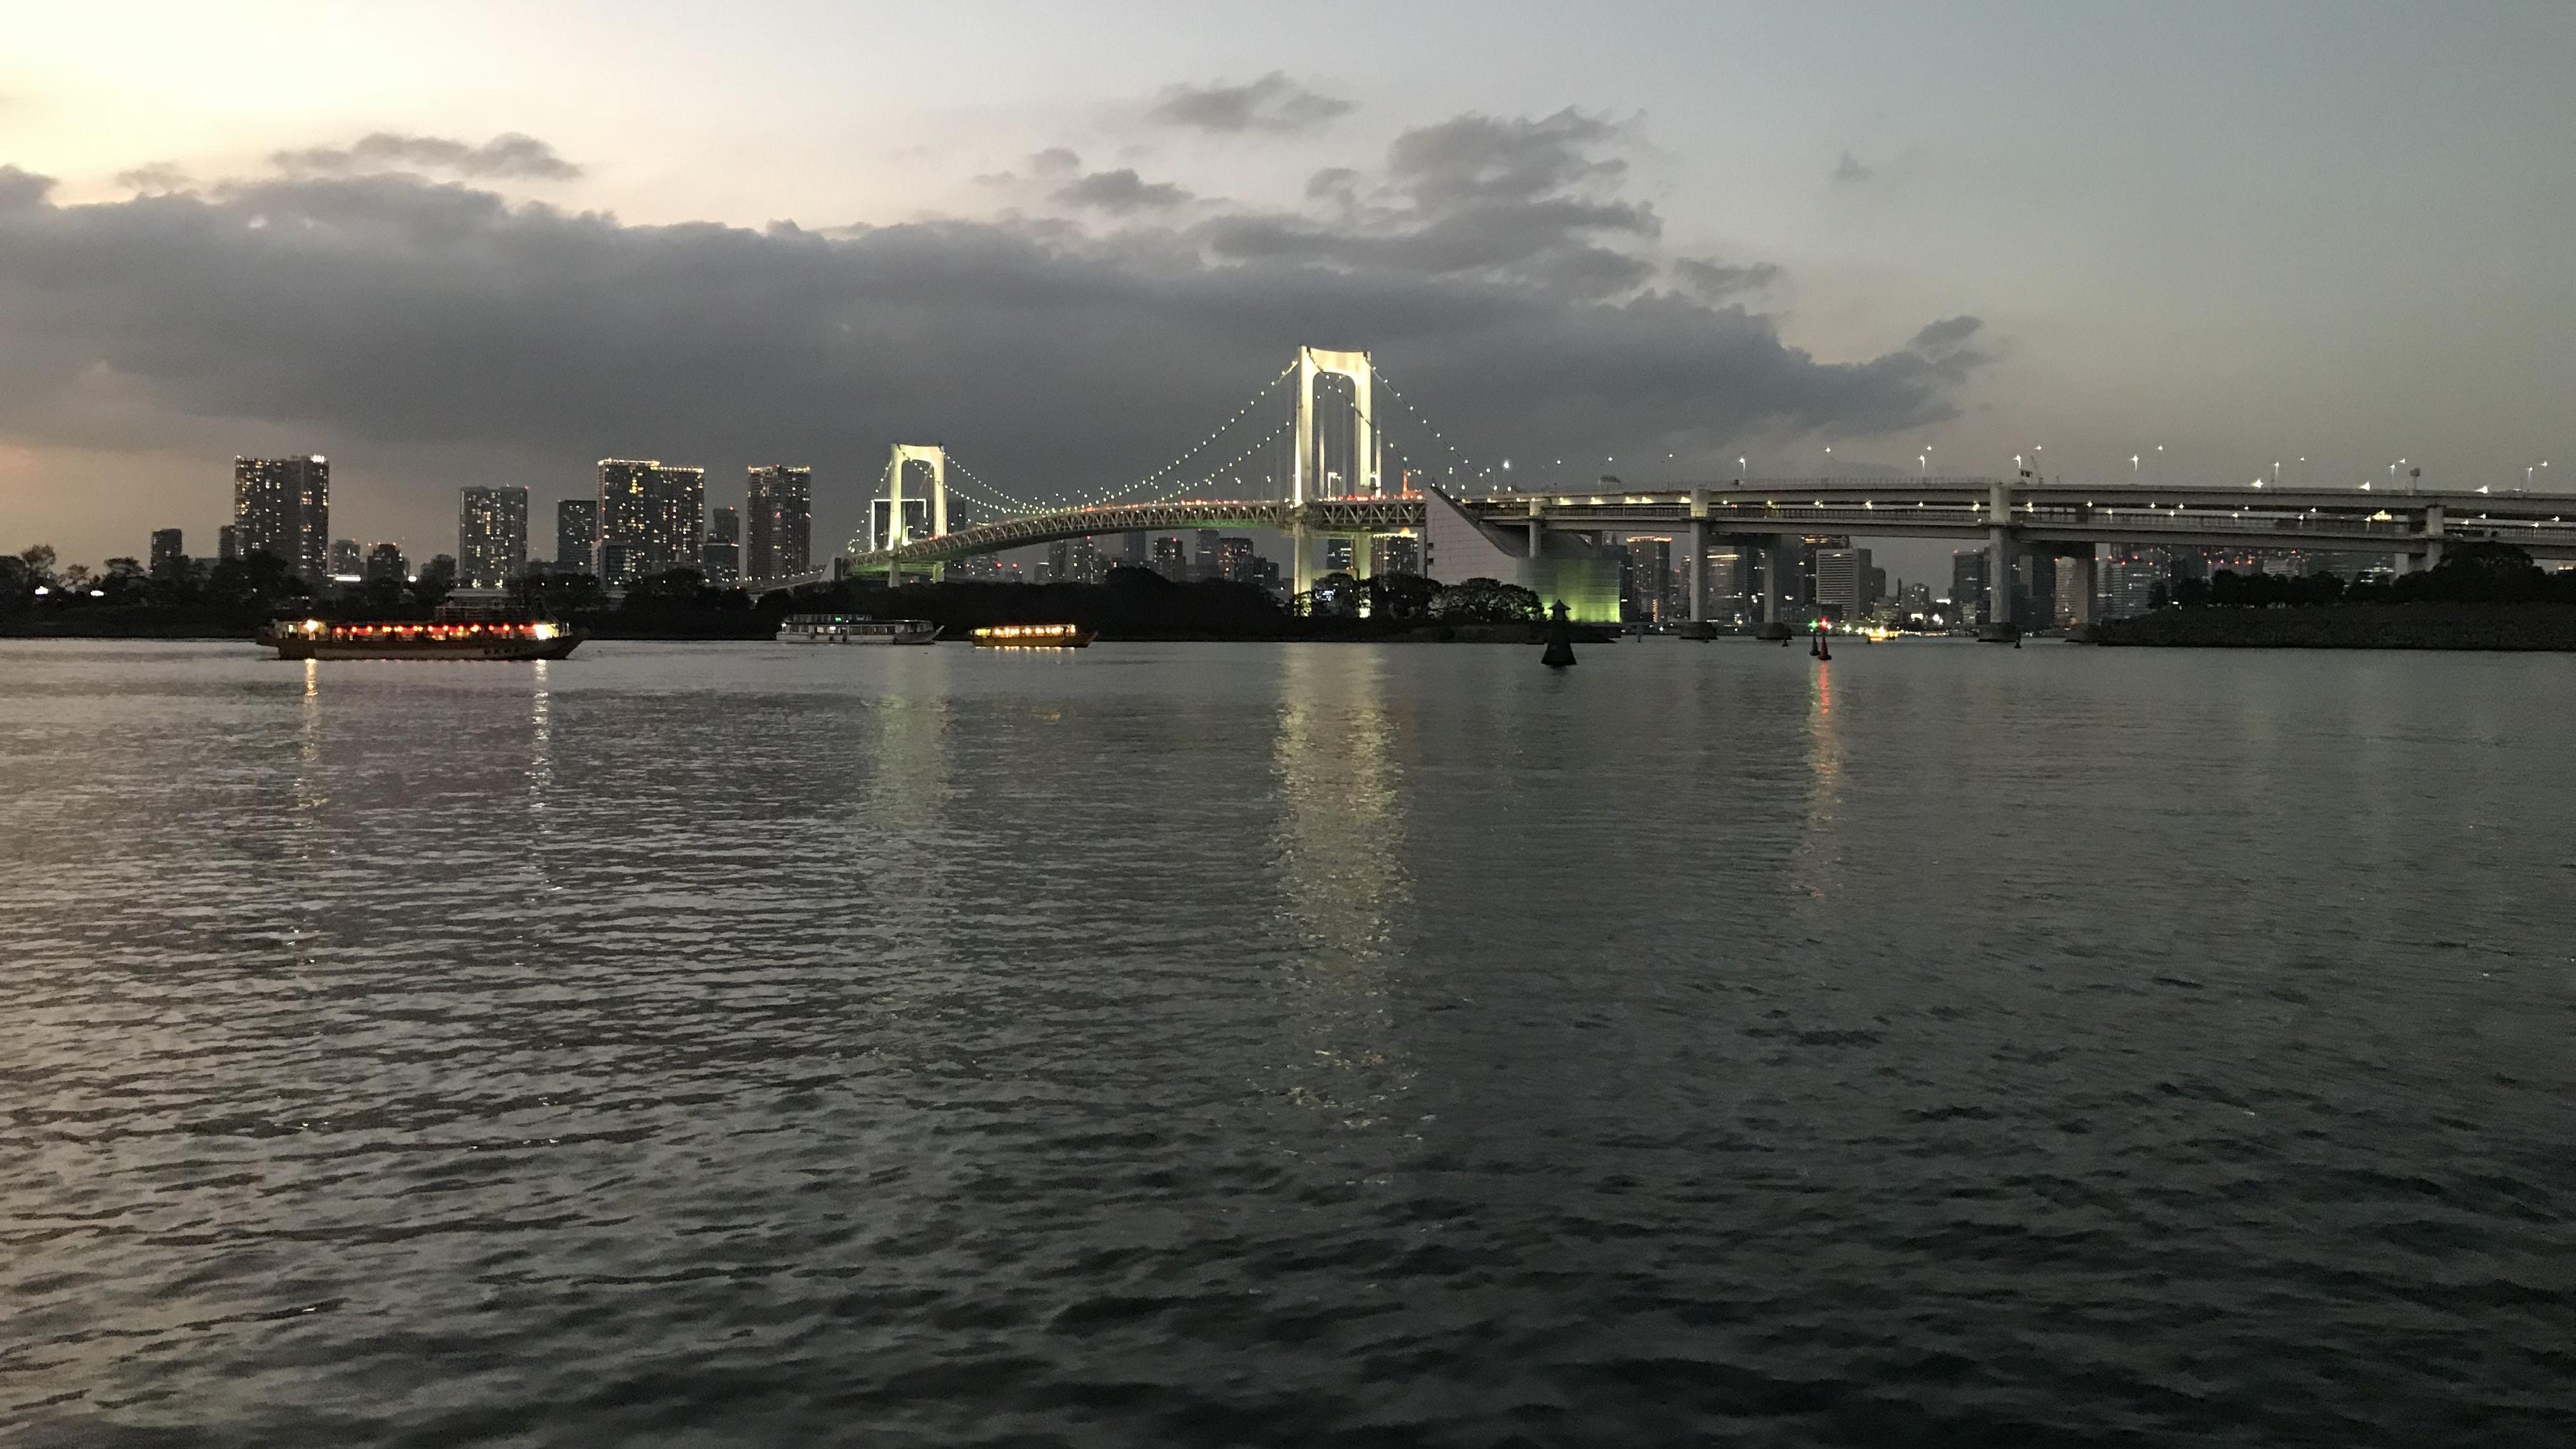 Rainbow Bridge in Tokio